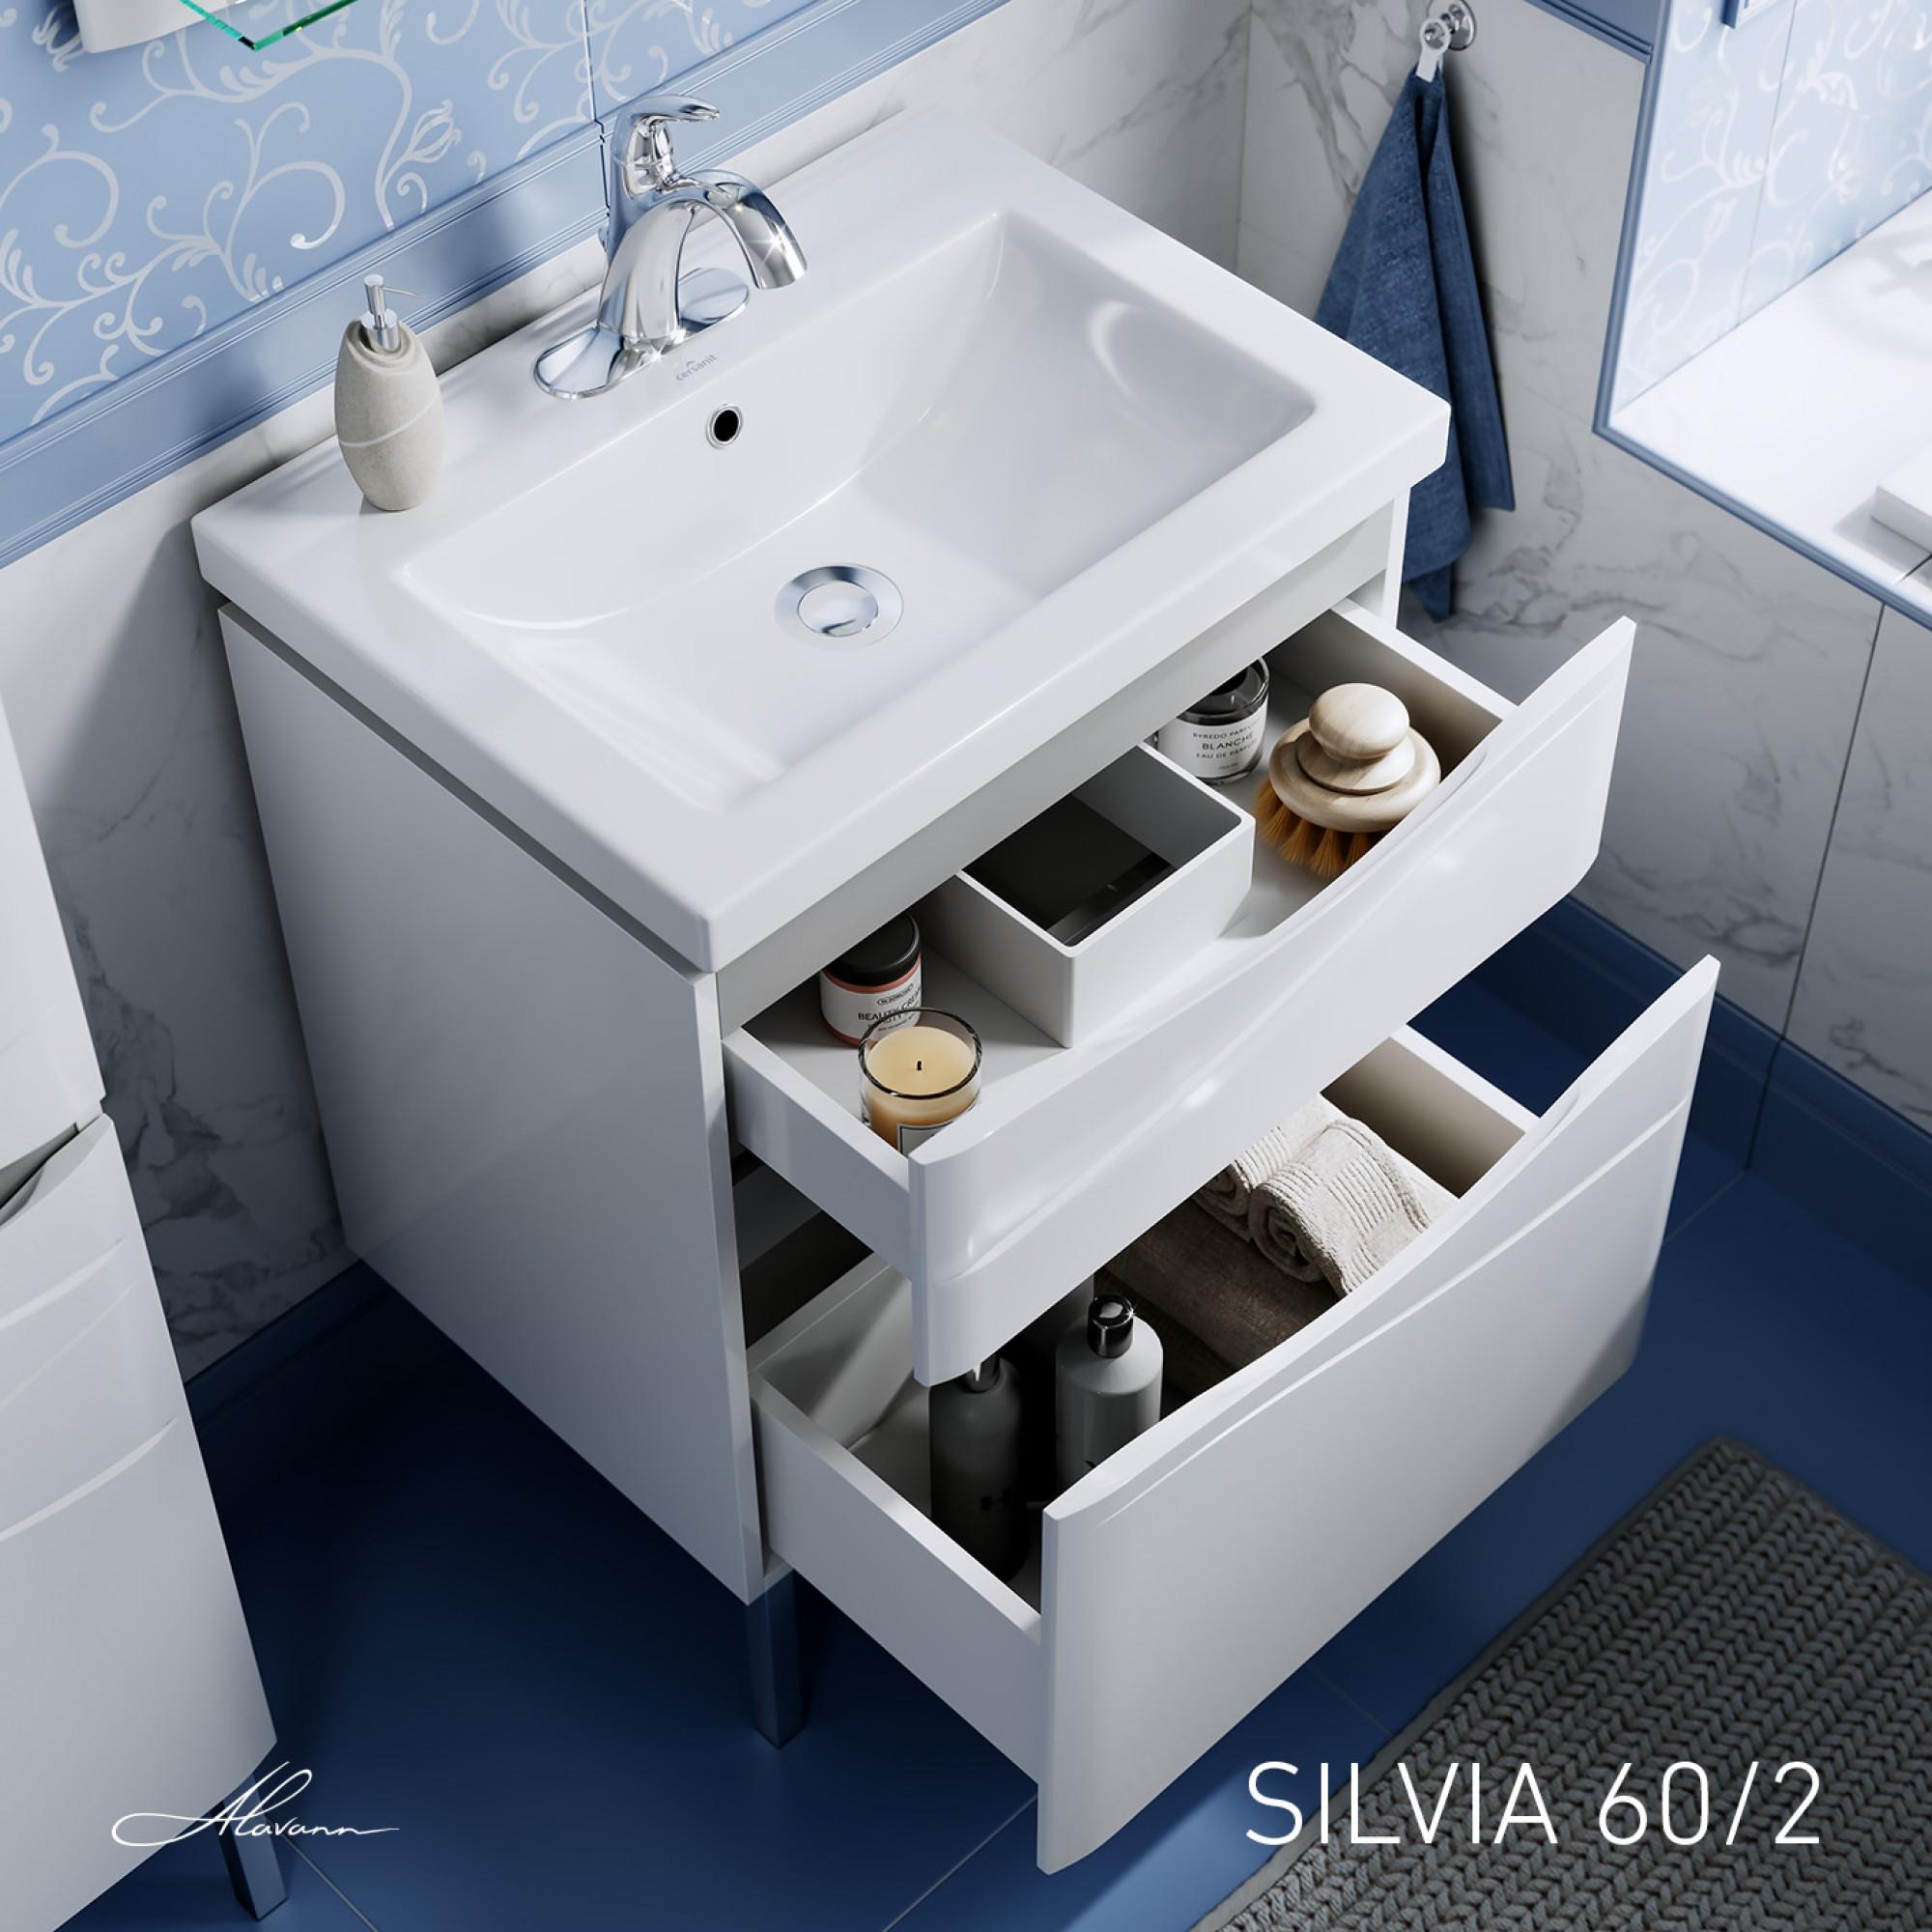 Тумба с раковиной Silvia 60/2 белая